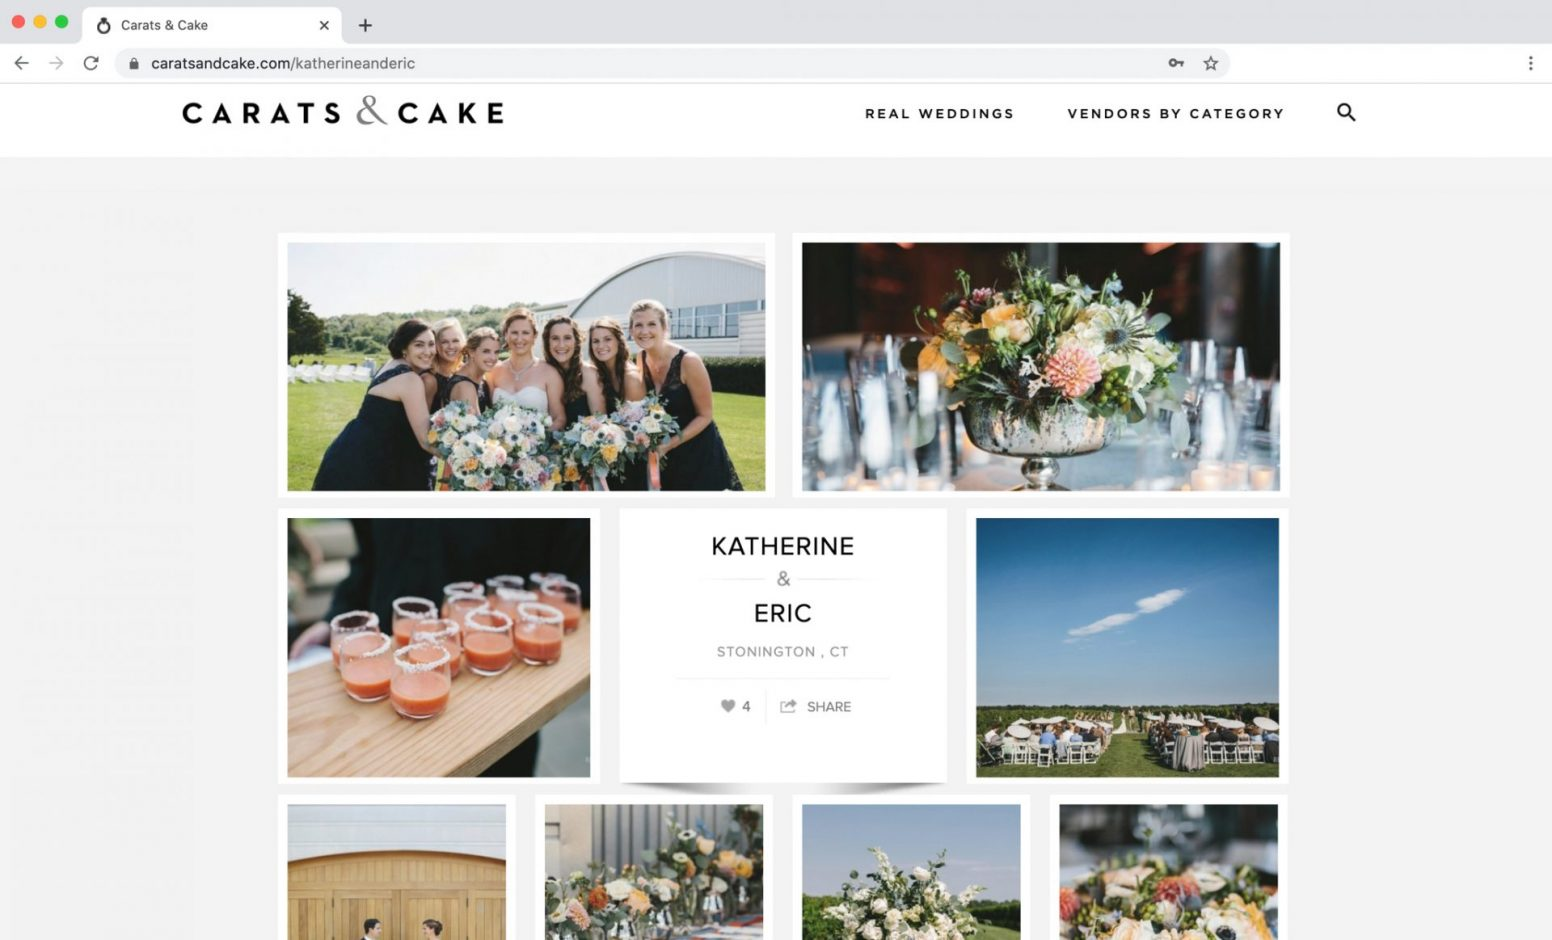 Carats & Cake Feature Vineyard Wedding